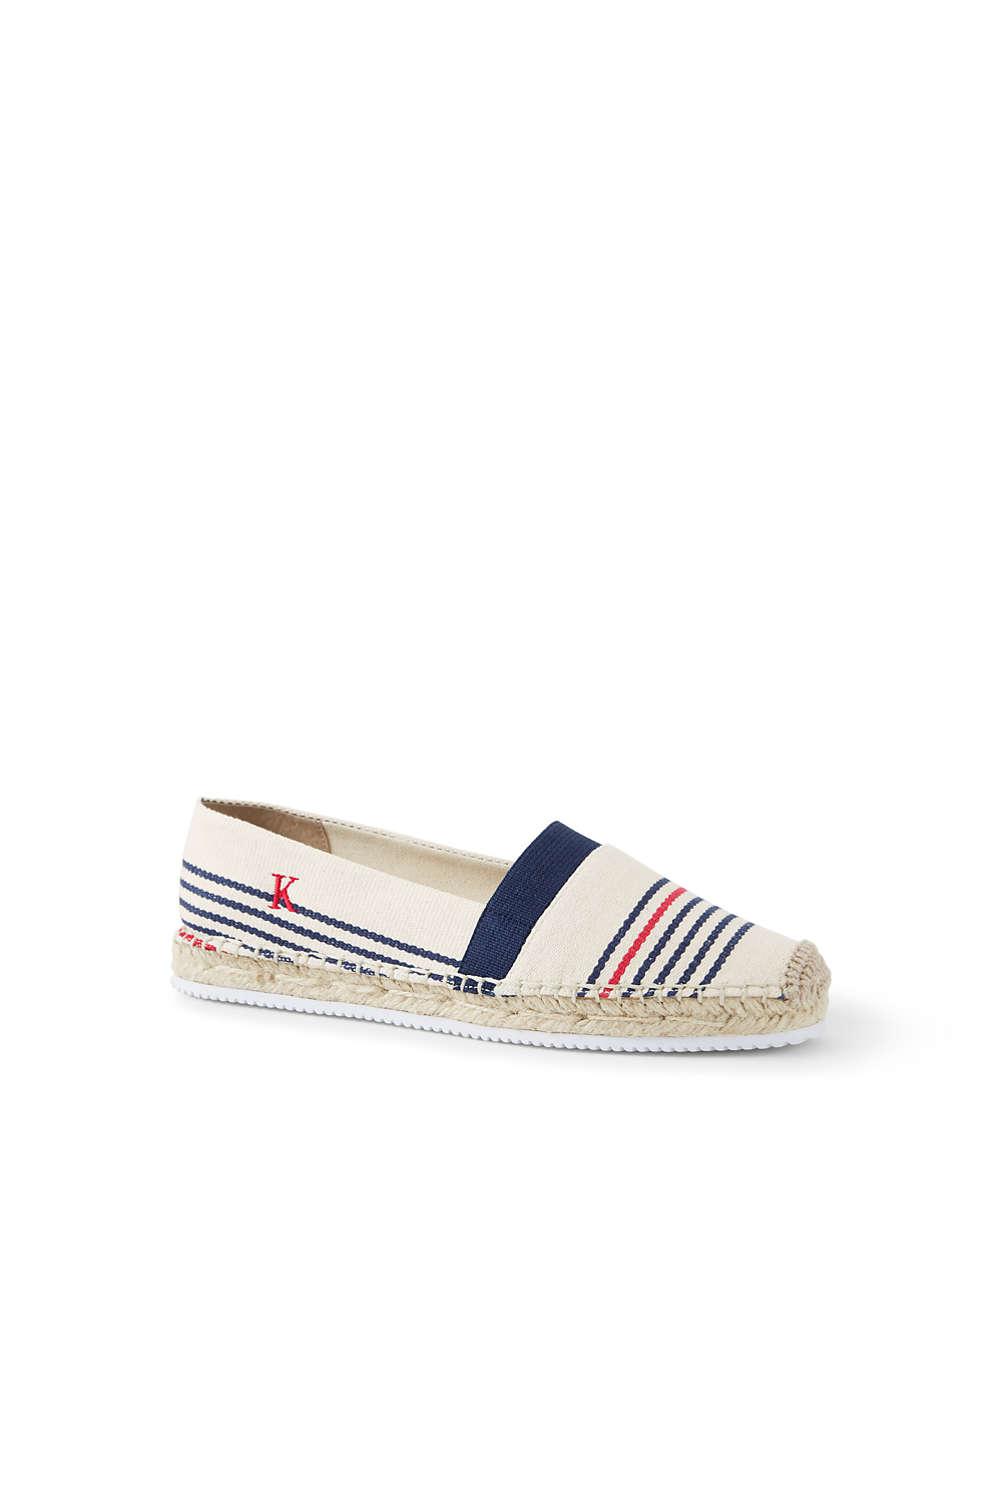 ce3f3d88e93 Women's Elastic Espadrille Shoes from Lands' End